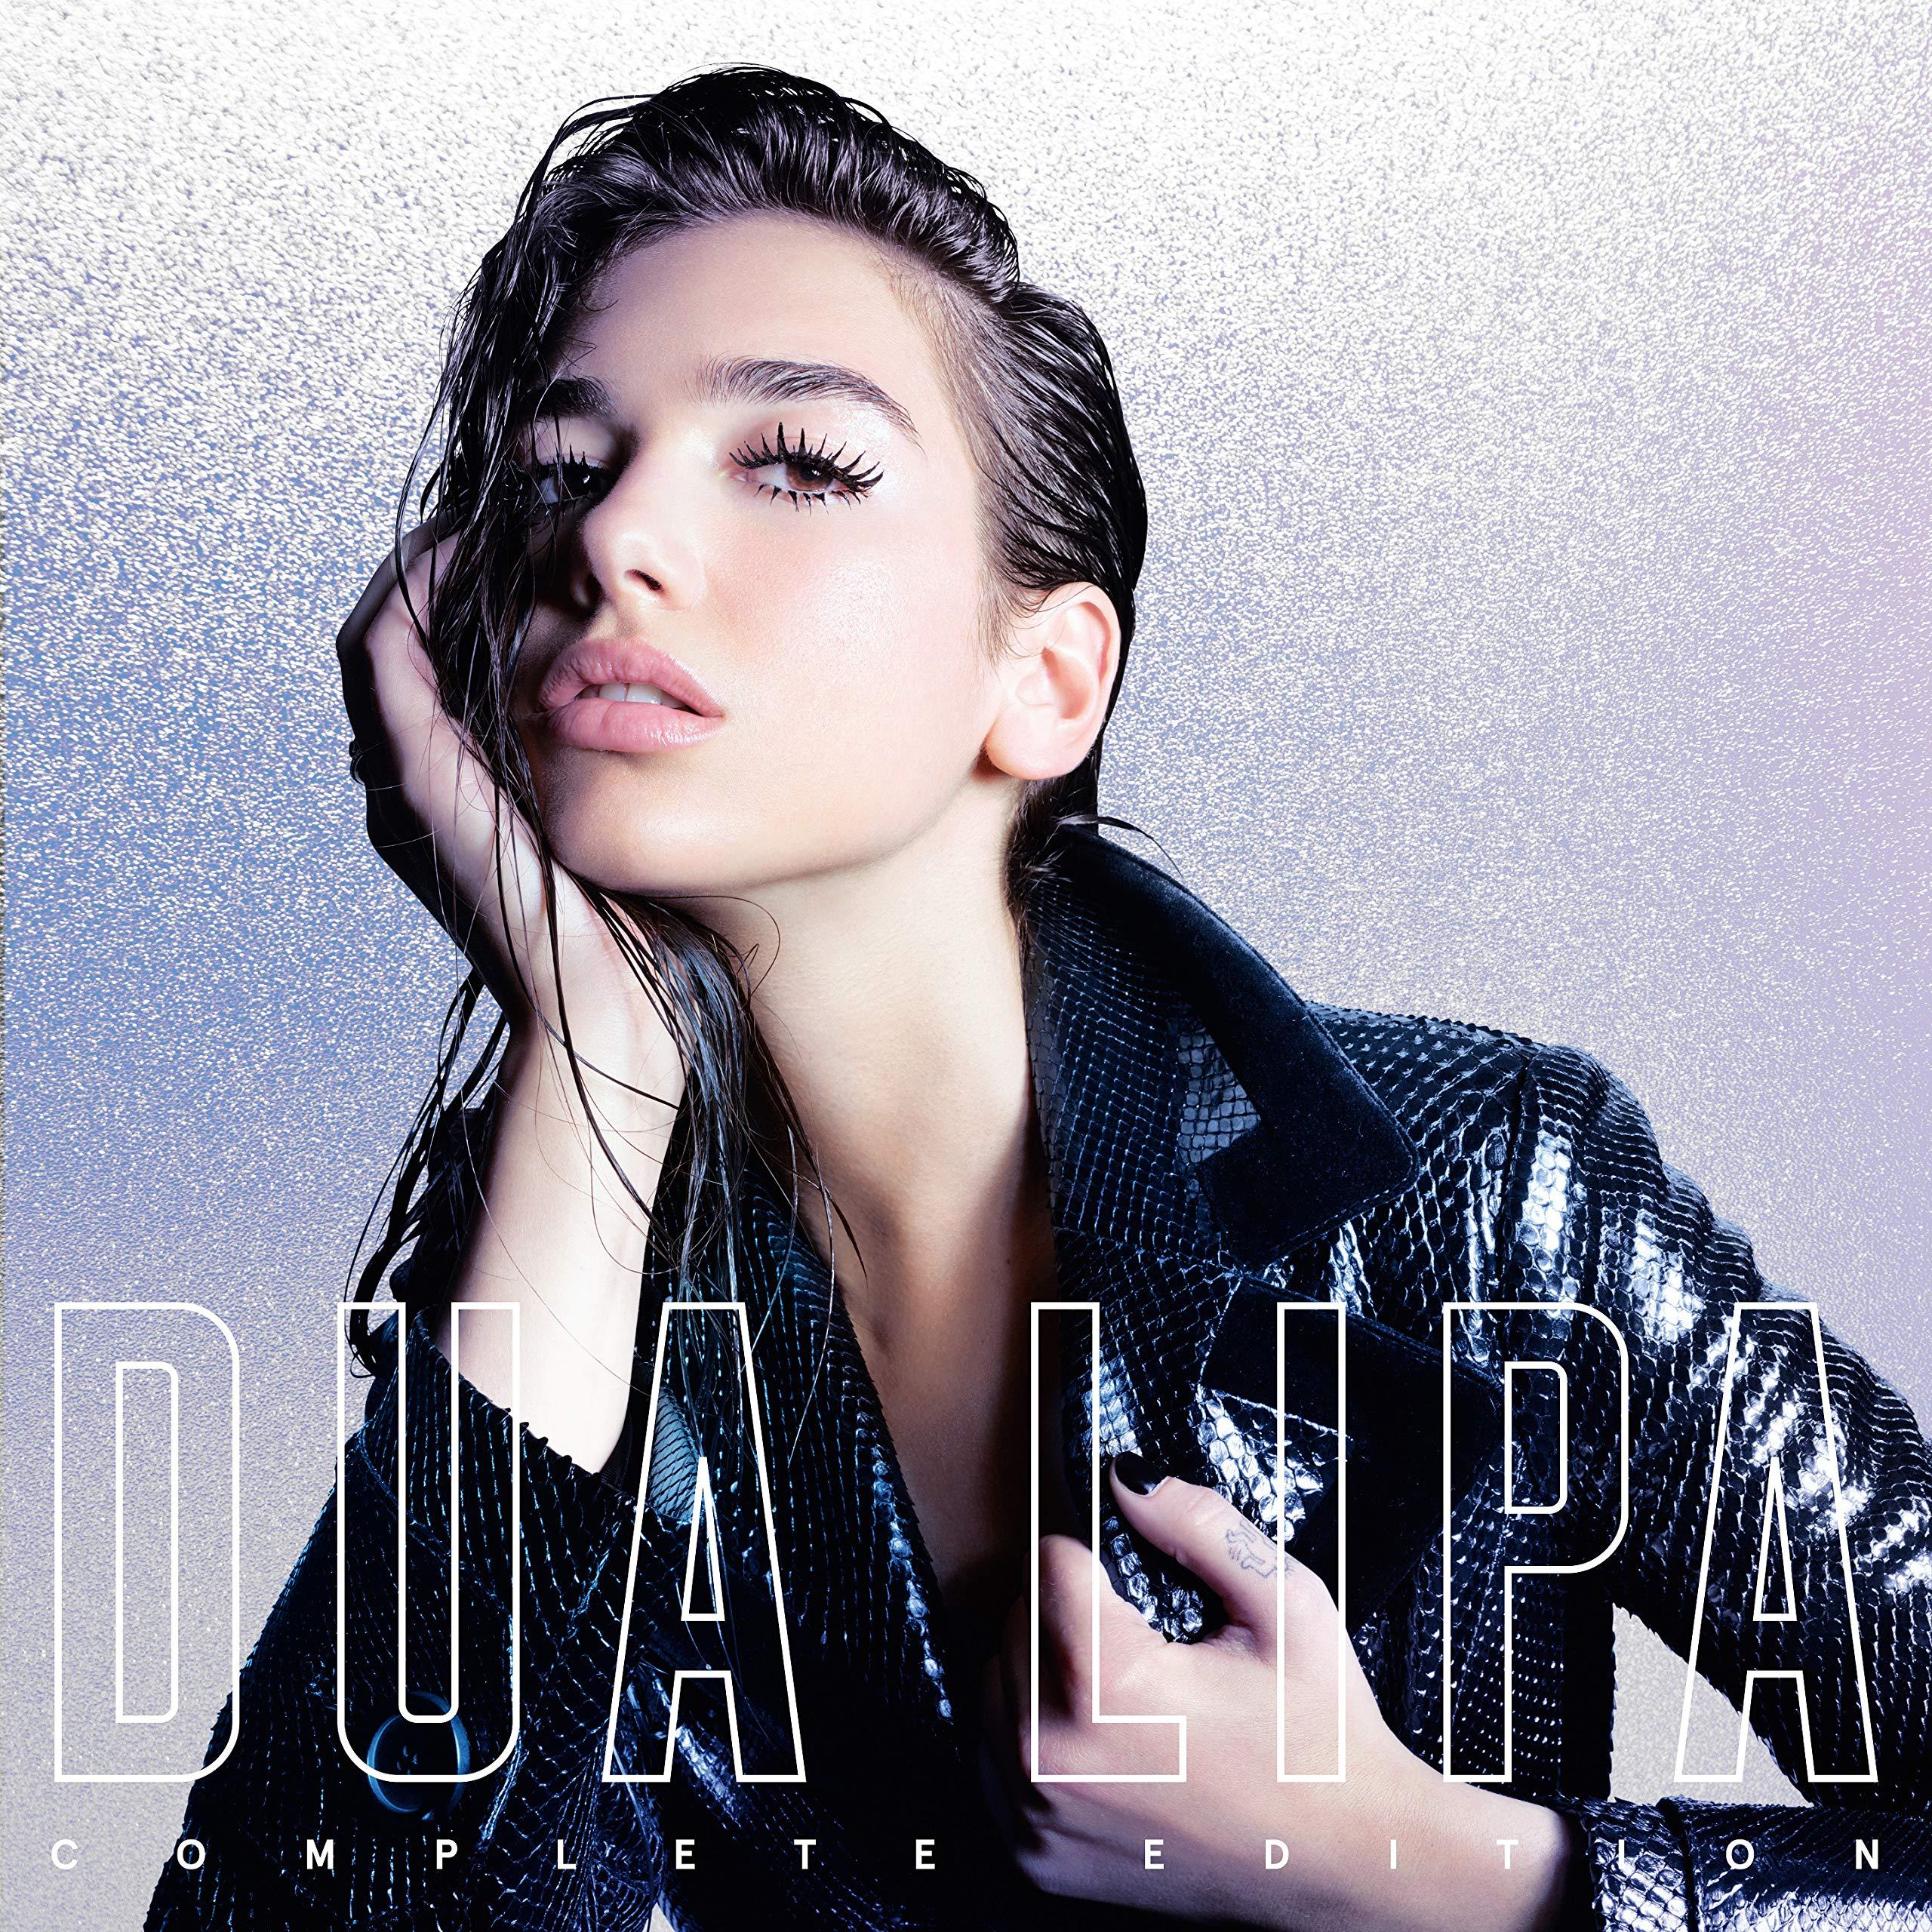 Vinilo : DUA LIPA - Dua Lipa: Complete Edition (180 Gram Vinyl)